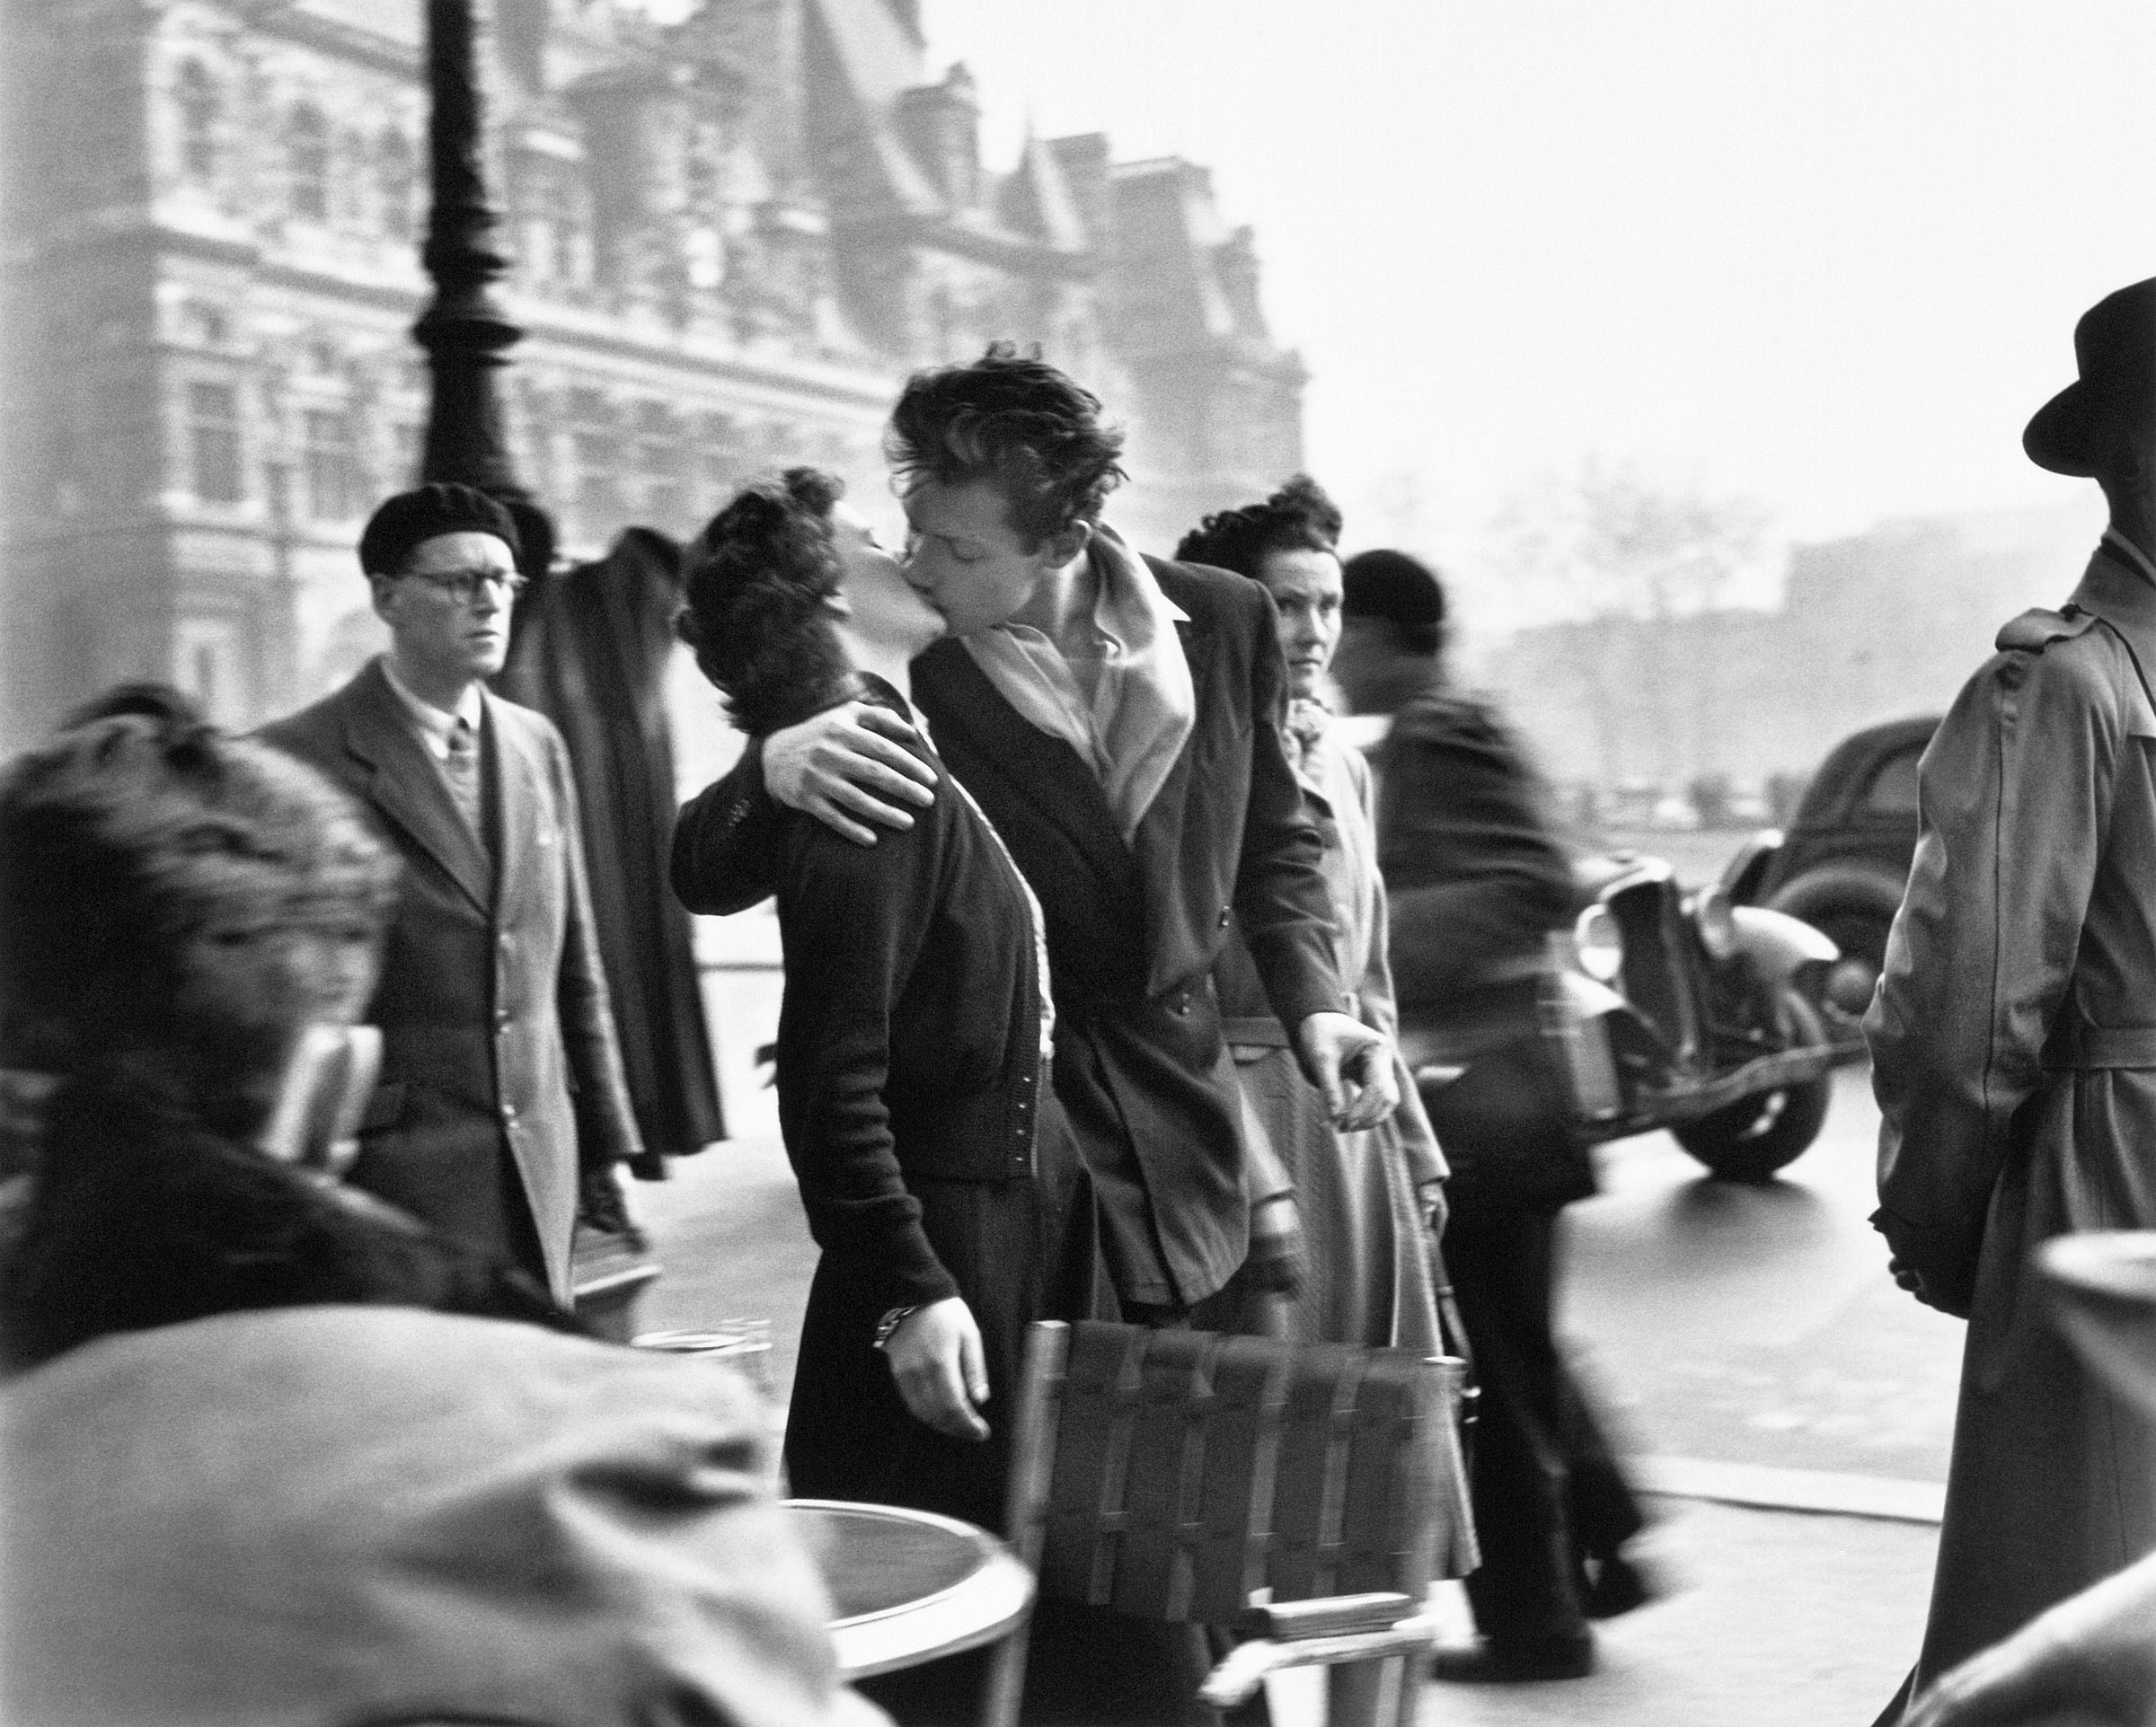 Robert Doisneau, Le baiser @ Atelier Robert Doisneau